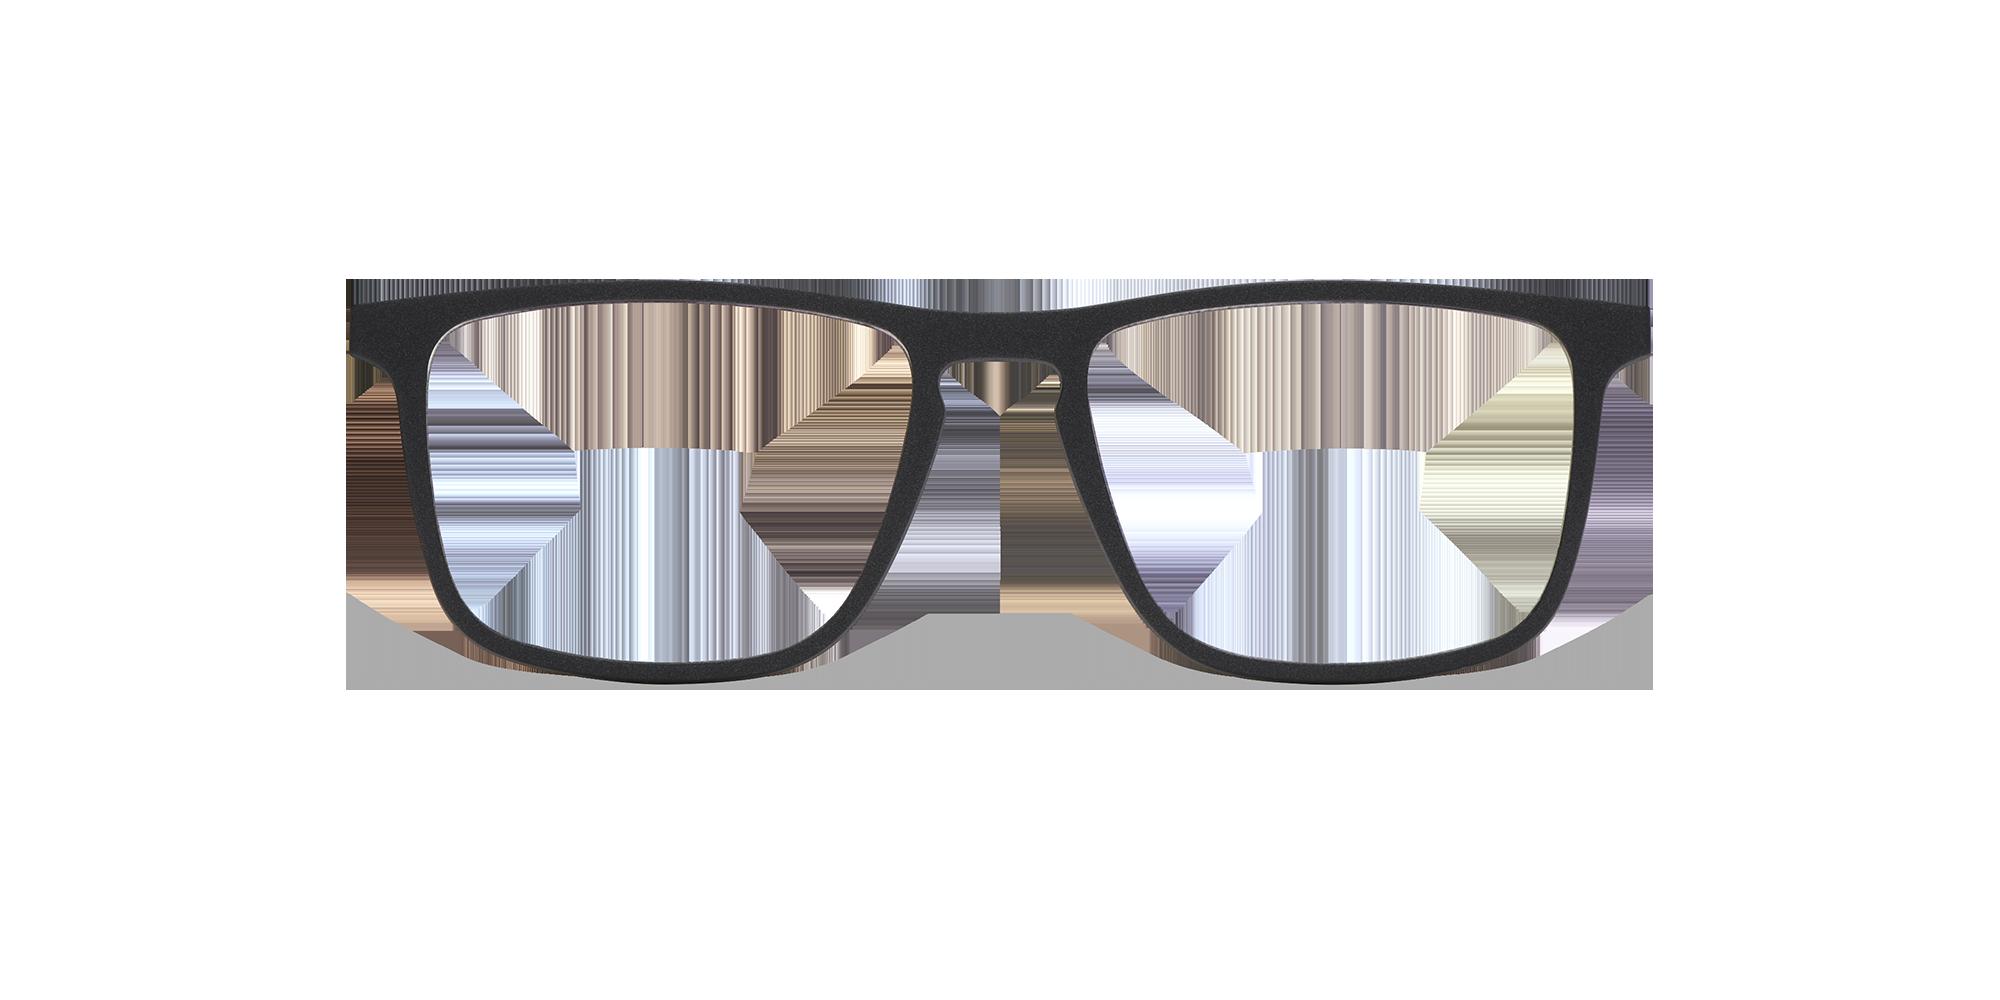 afflelou/france/products/smart_clip/clips_glasses/07630036428788_face.png